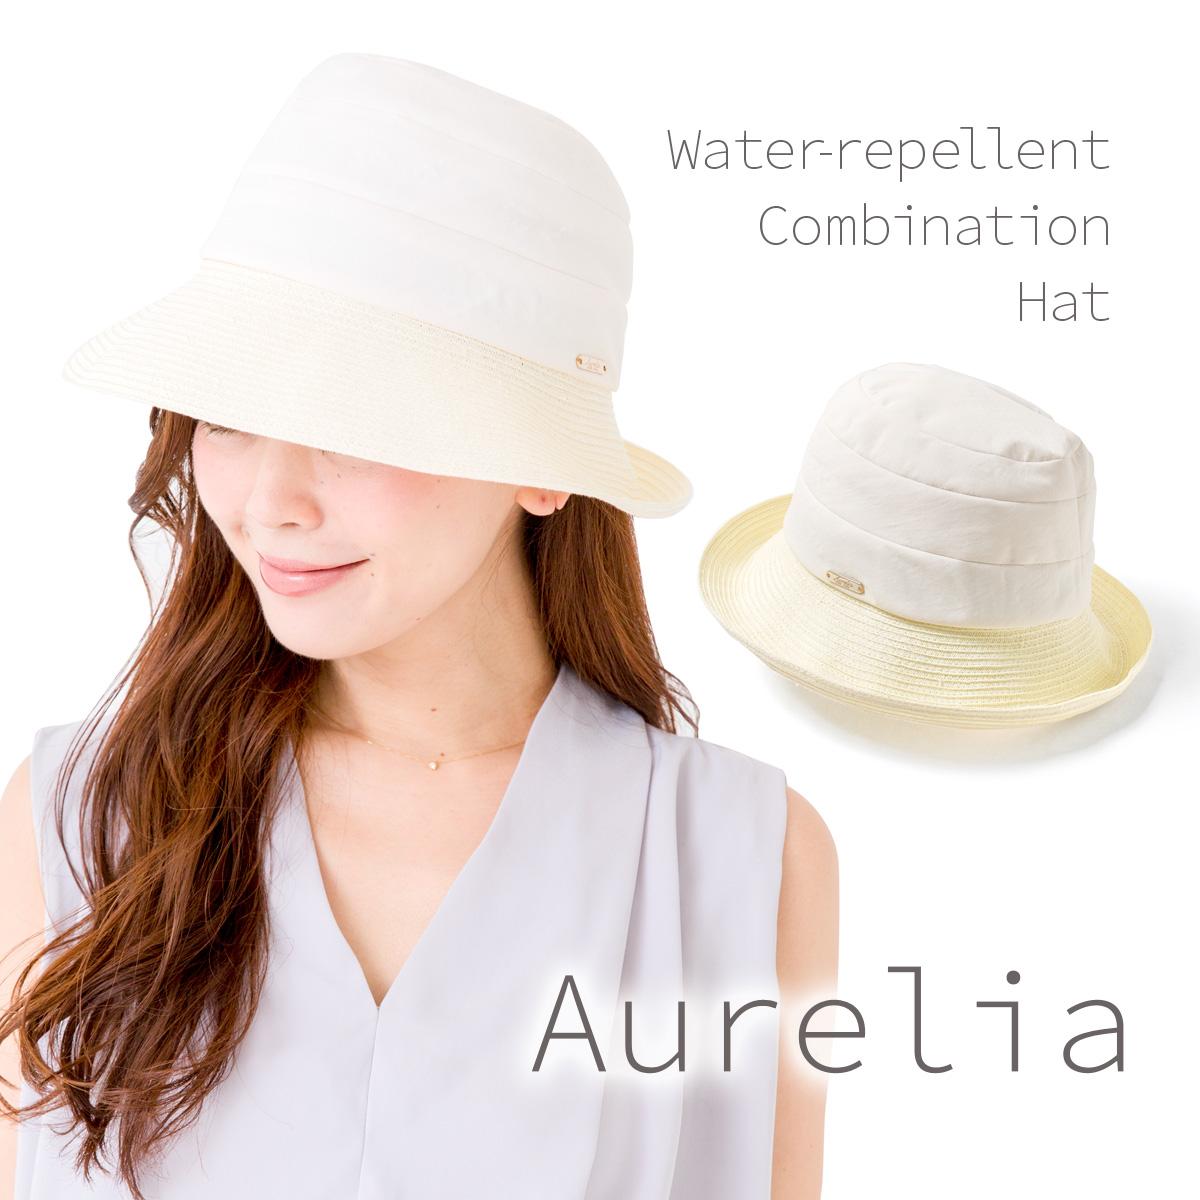 Aurelia 撥水ナイロンコンビハット【日本製】【送料無料】 帽子 レディース